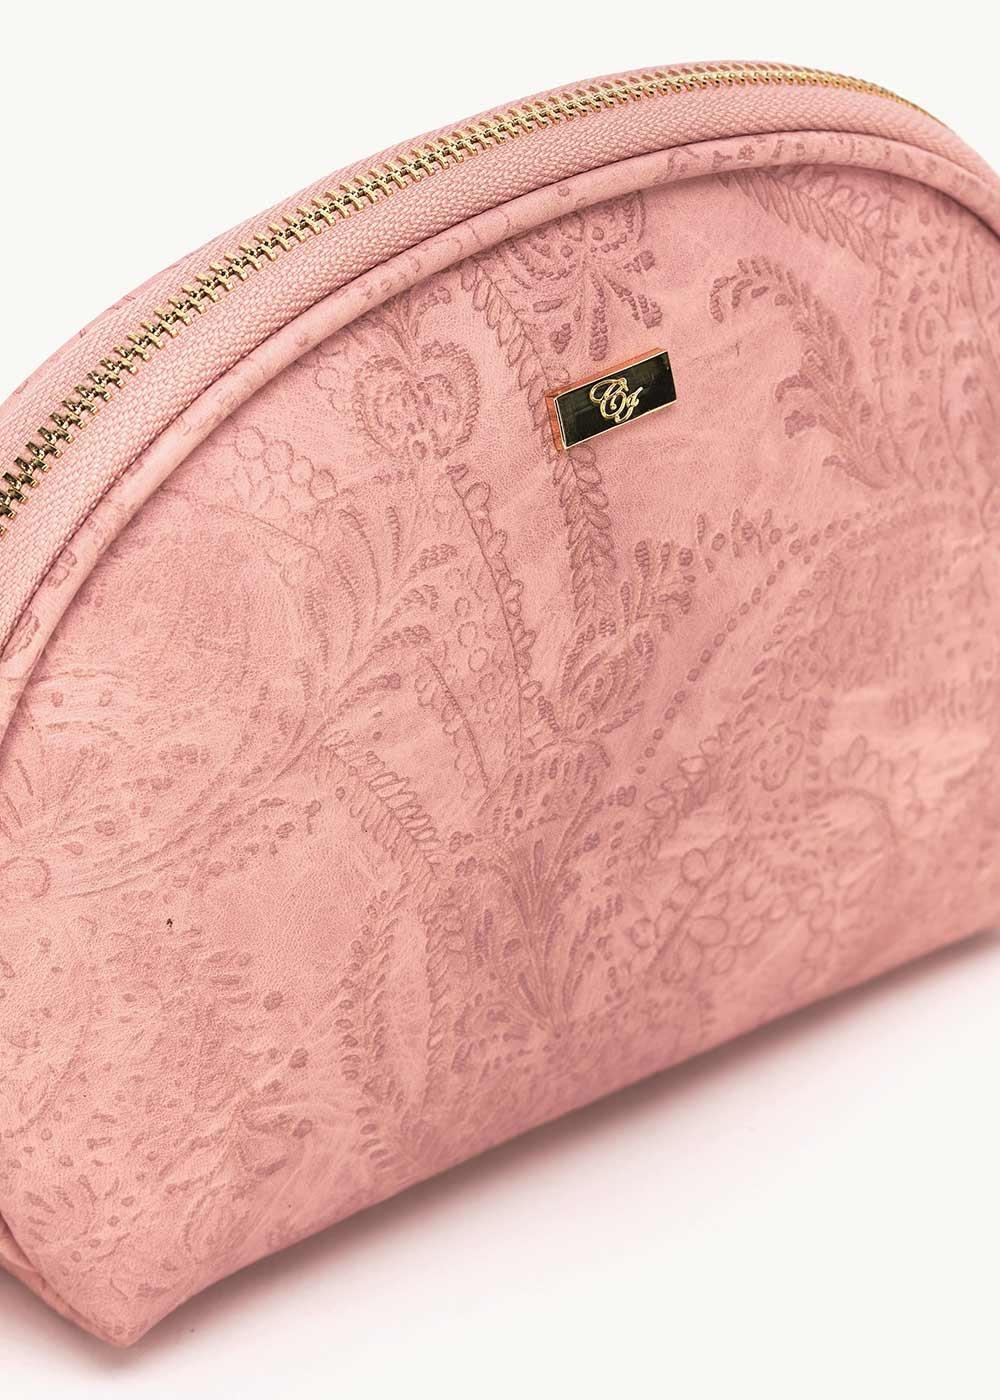 Bahia purse with cashmere effect - Skin - Woman